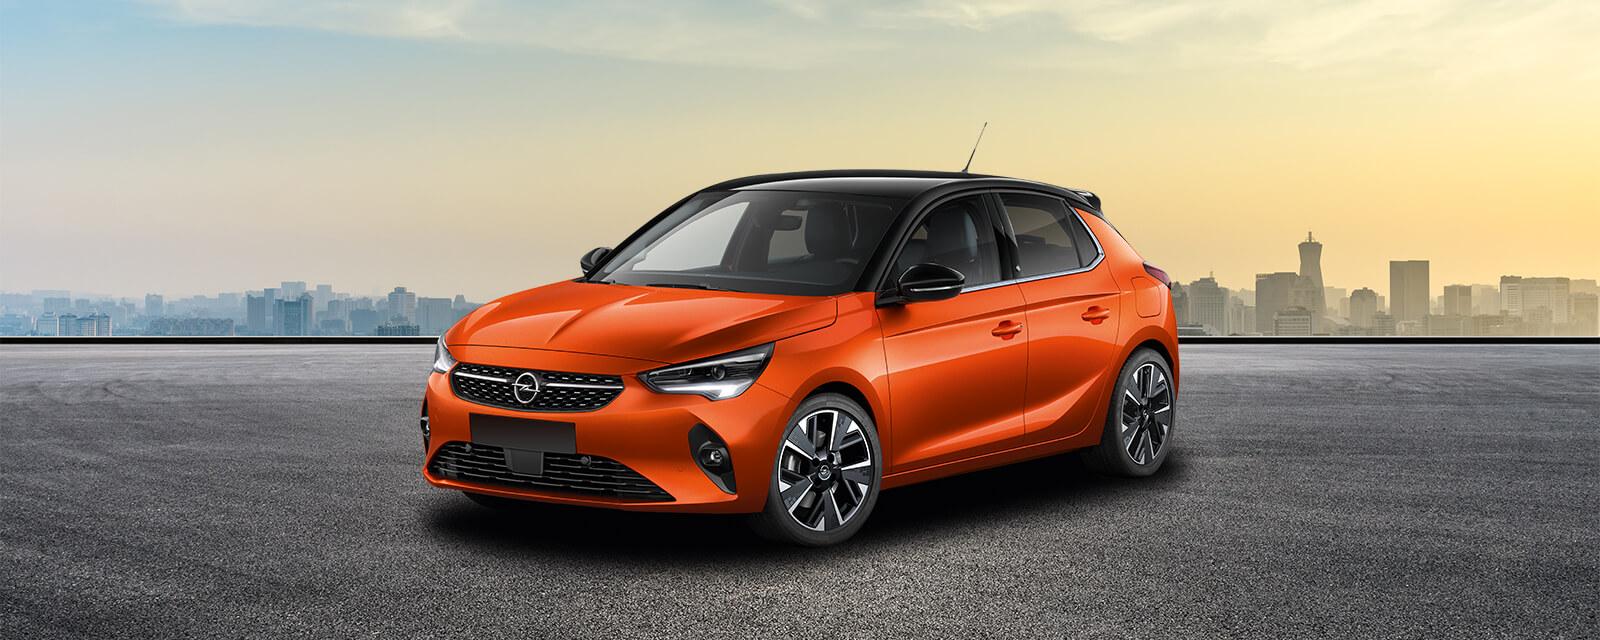 opel corsa e 5d orange 2019